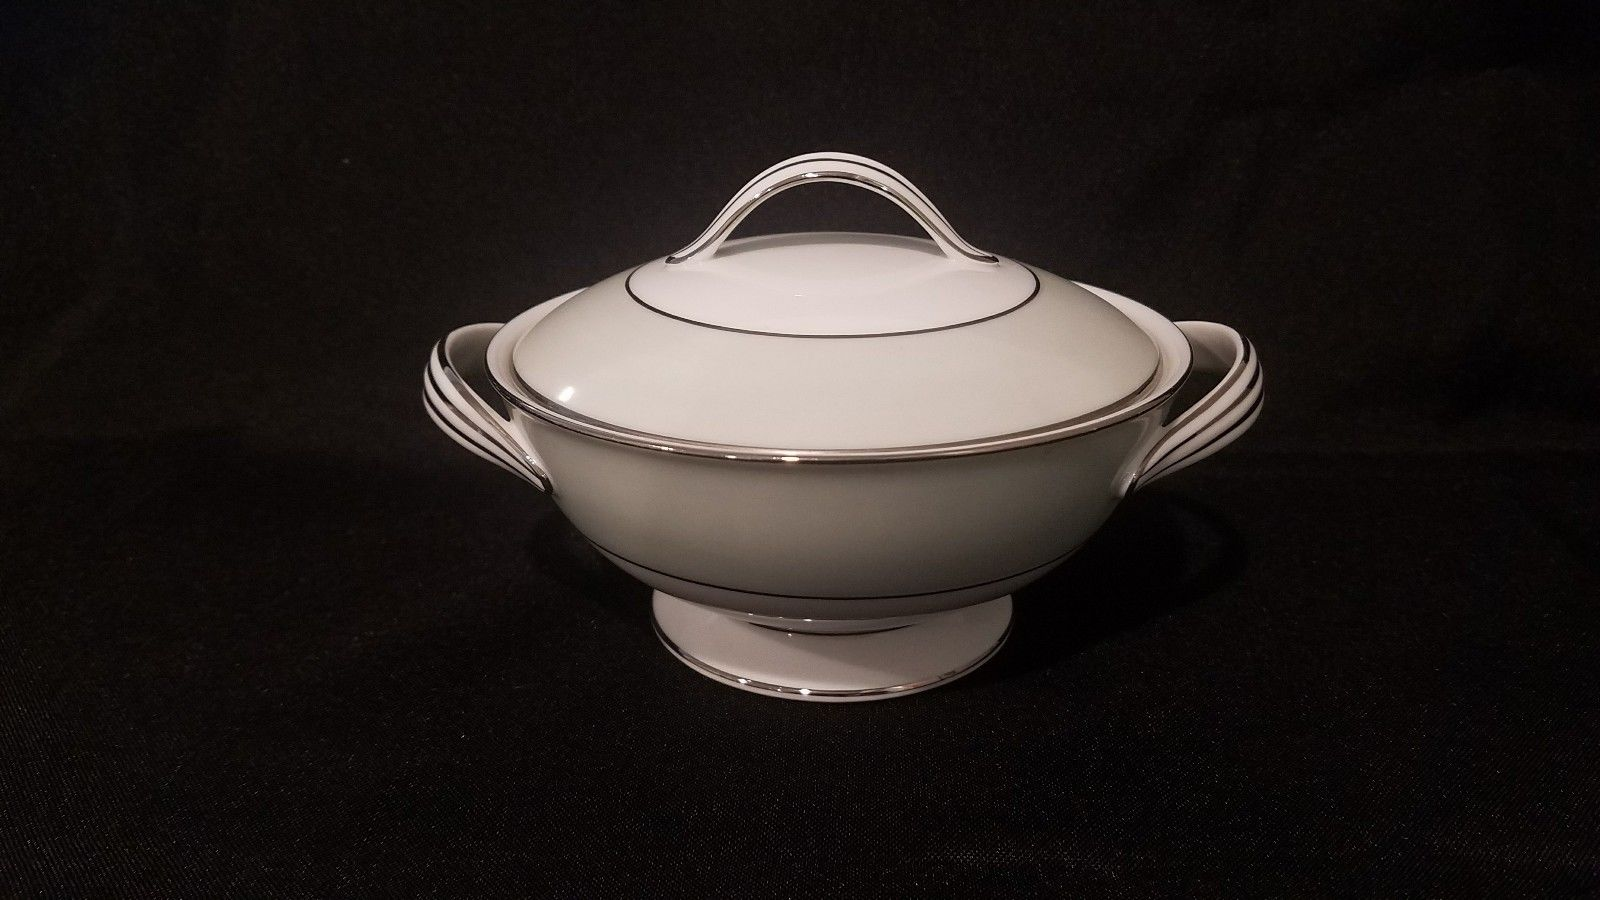 noritake china greencourt sugar bowl  $18.99